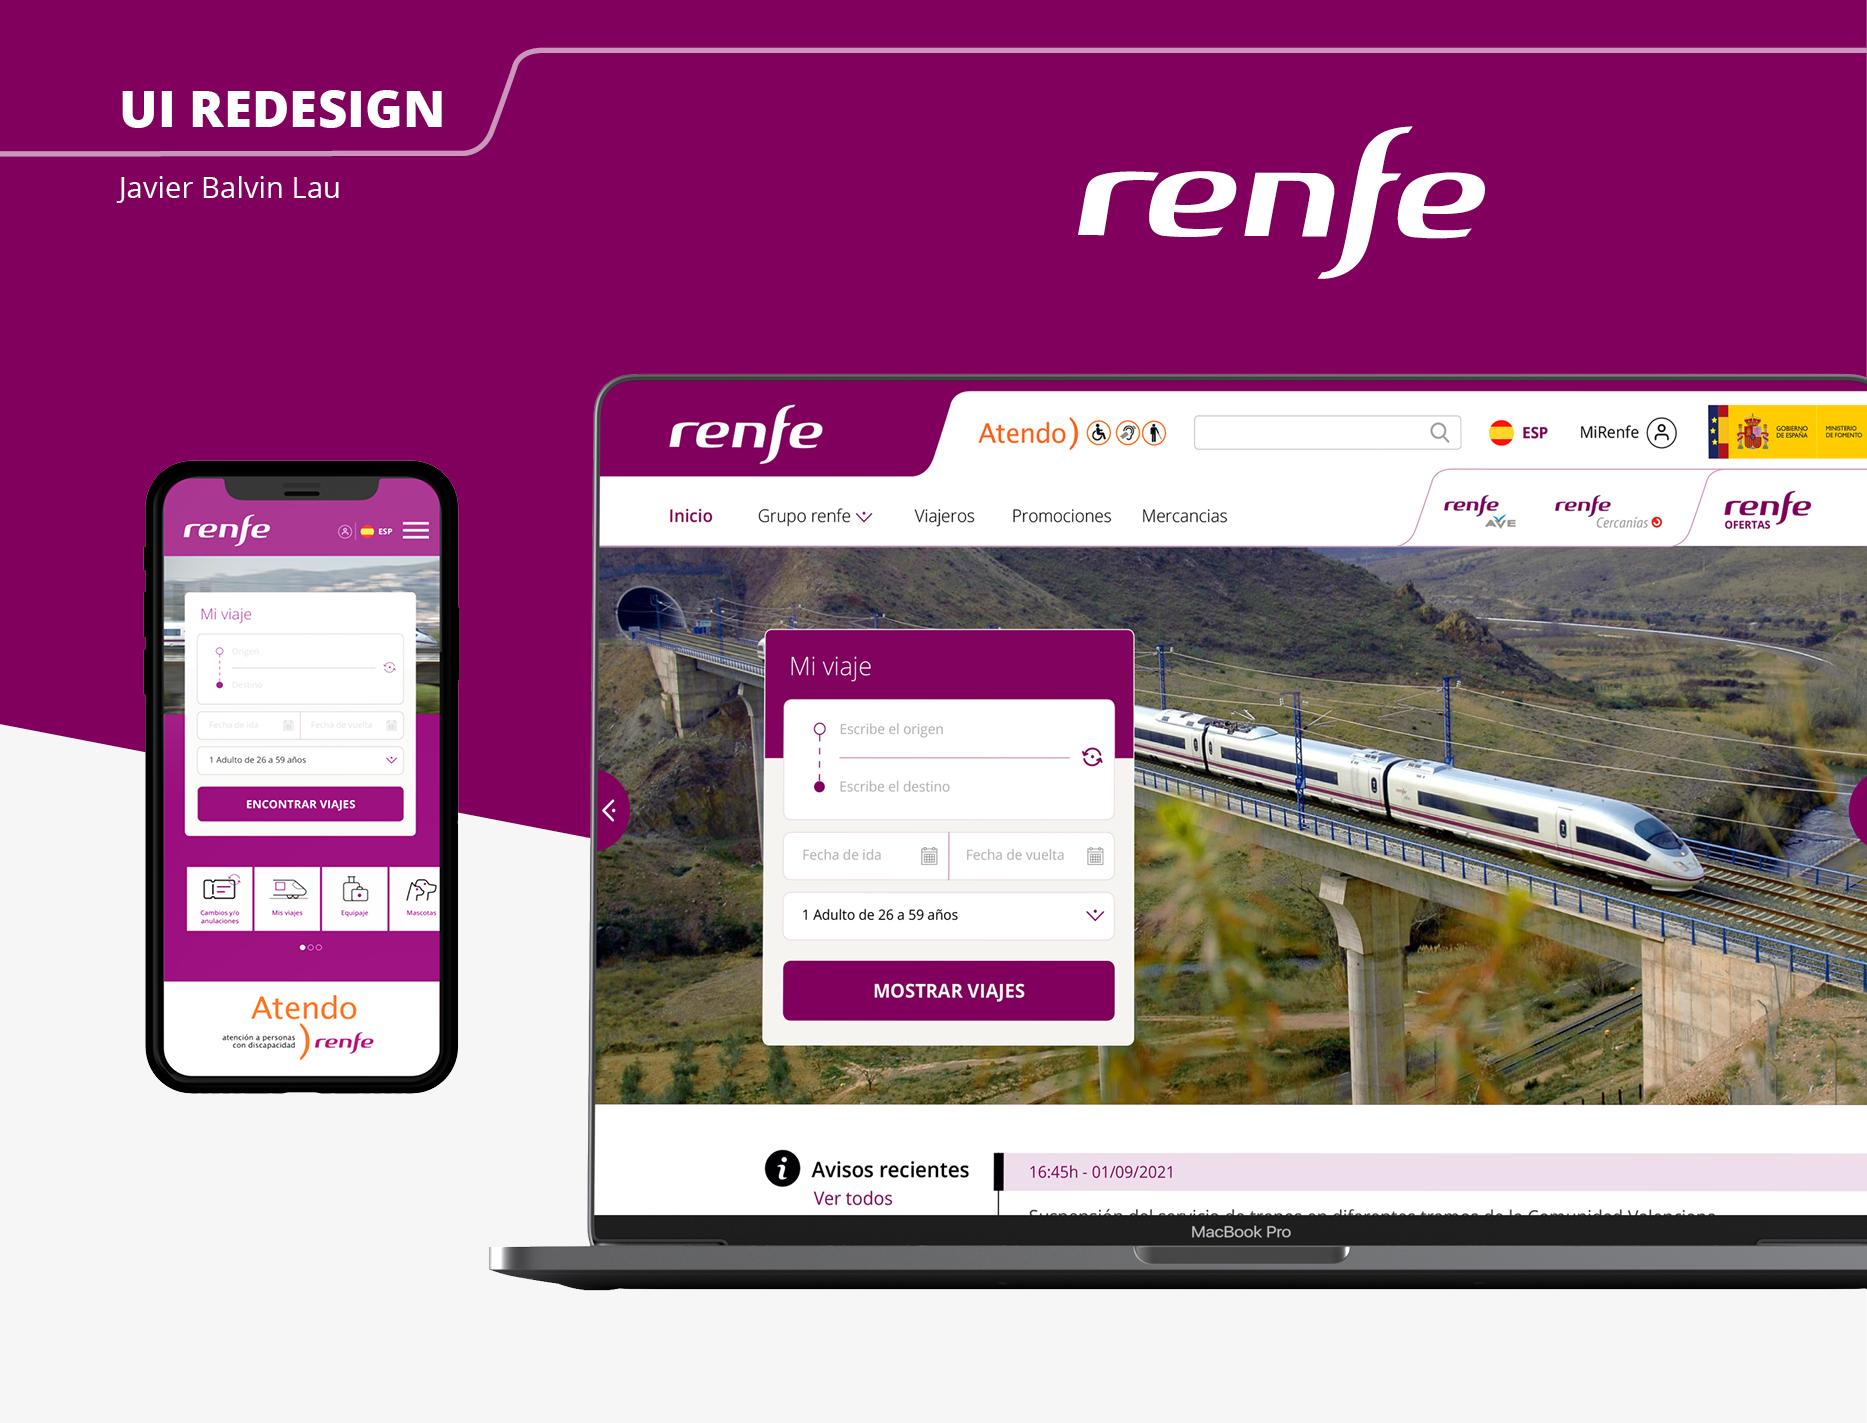 rediseño-web-renfe-diseño-nuevo-2019-20202